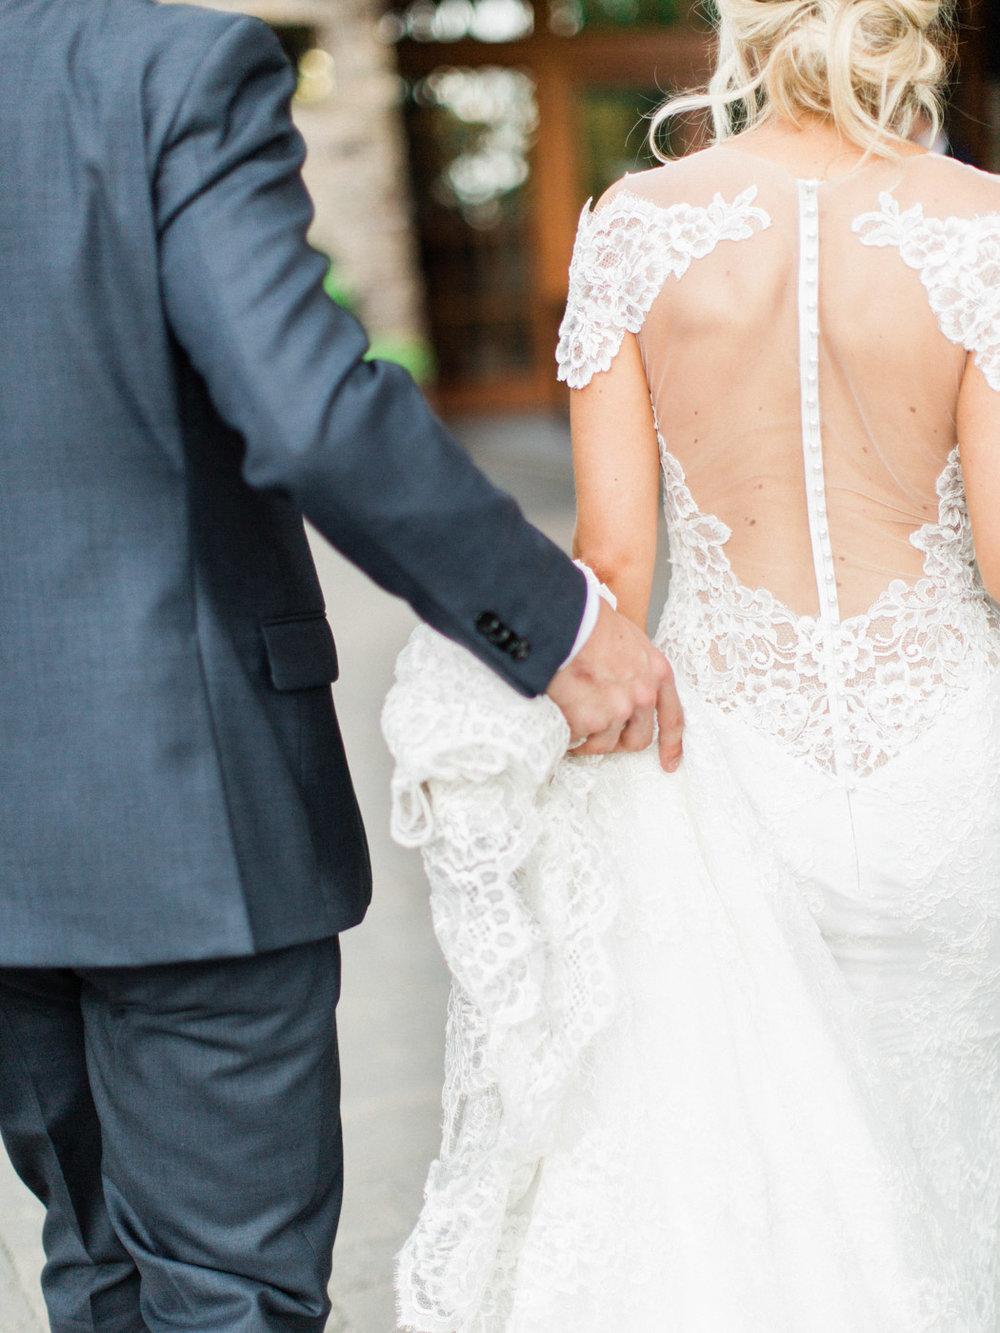 Toronto-Muskoka-wedding-photographer-summery-fun-documentary-the-marriott-rosseau108.jpg